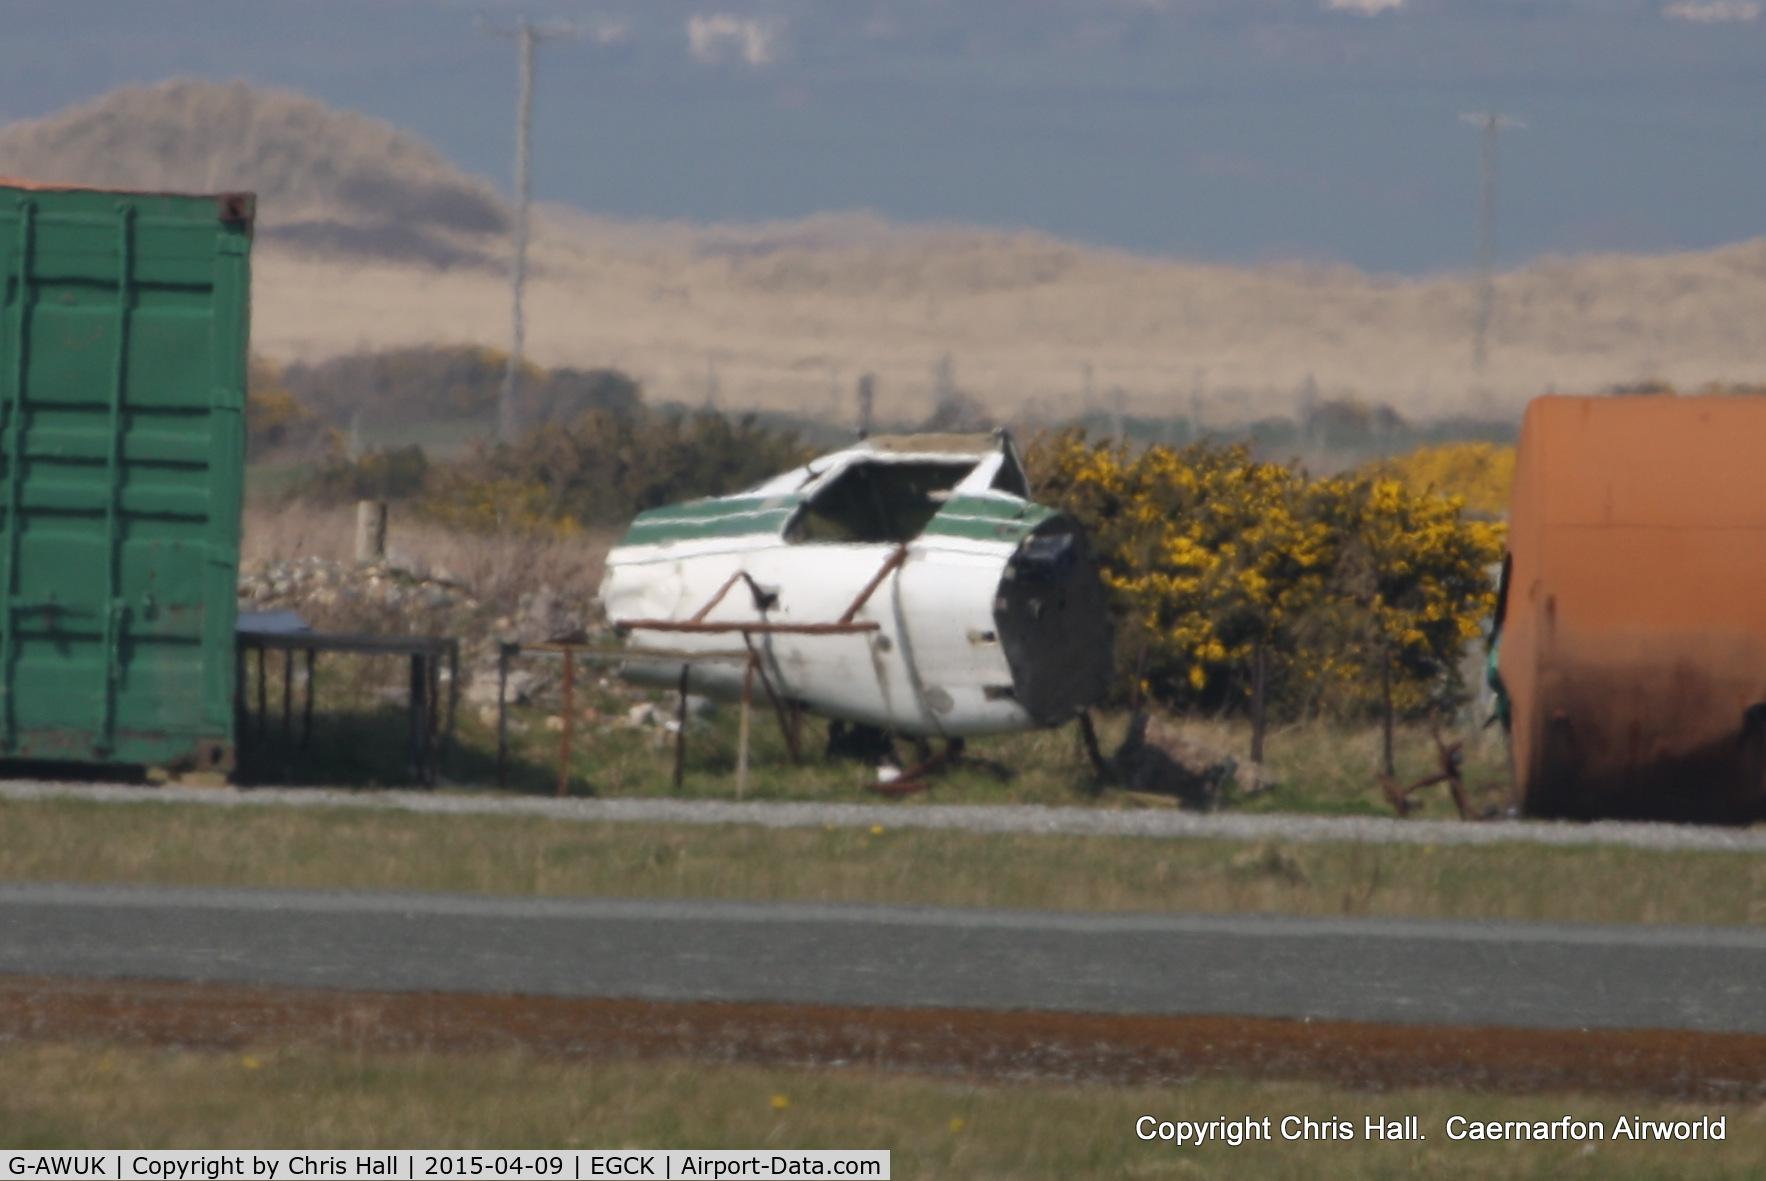 G-AWUK, 1968 Reims F150H C/N 0344, on the fire dump at Caernarfon